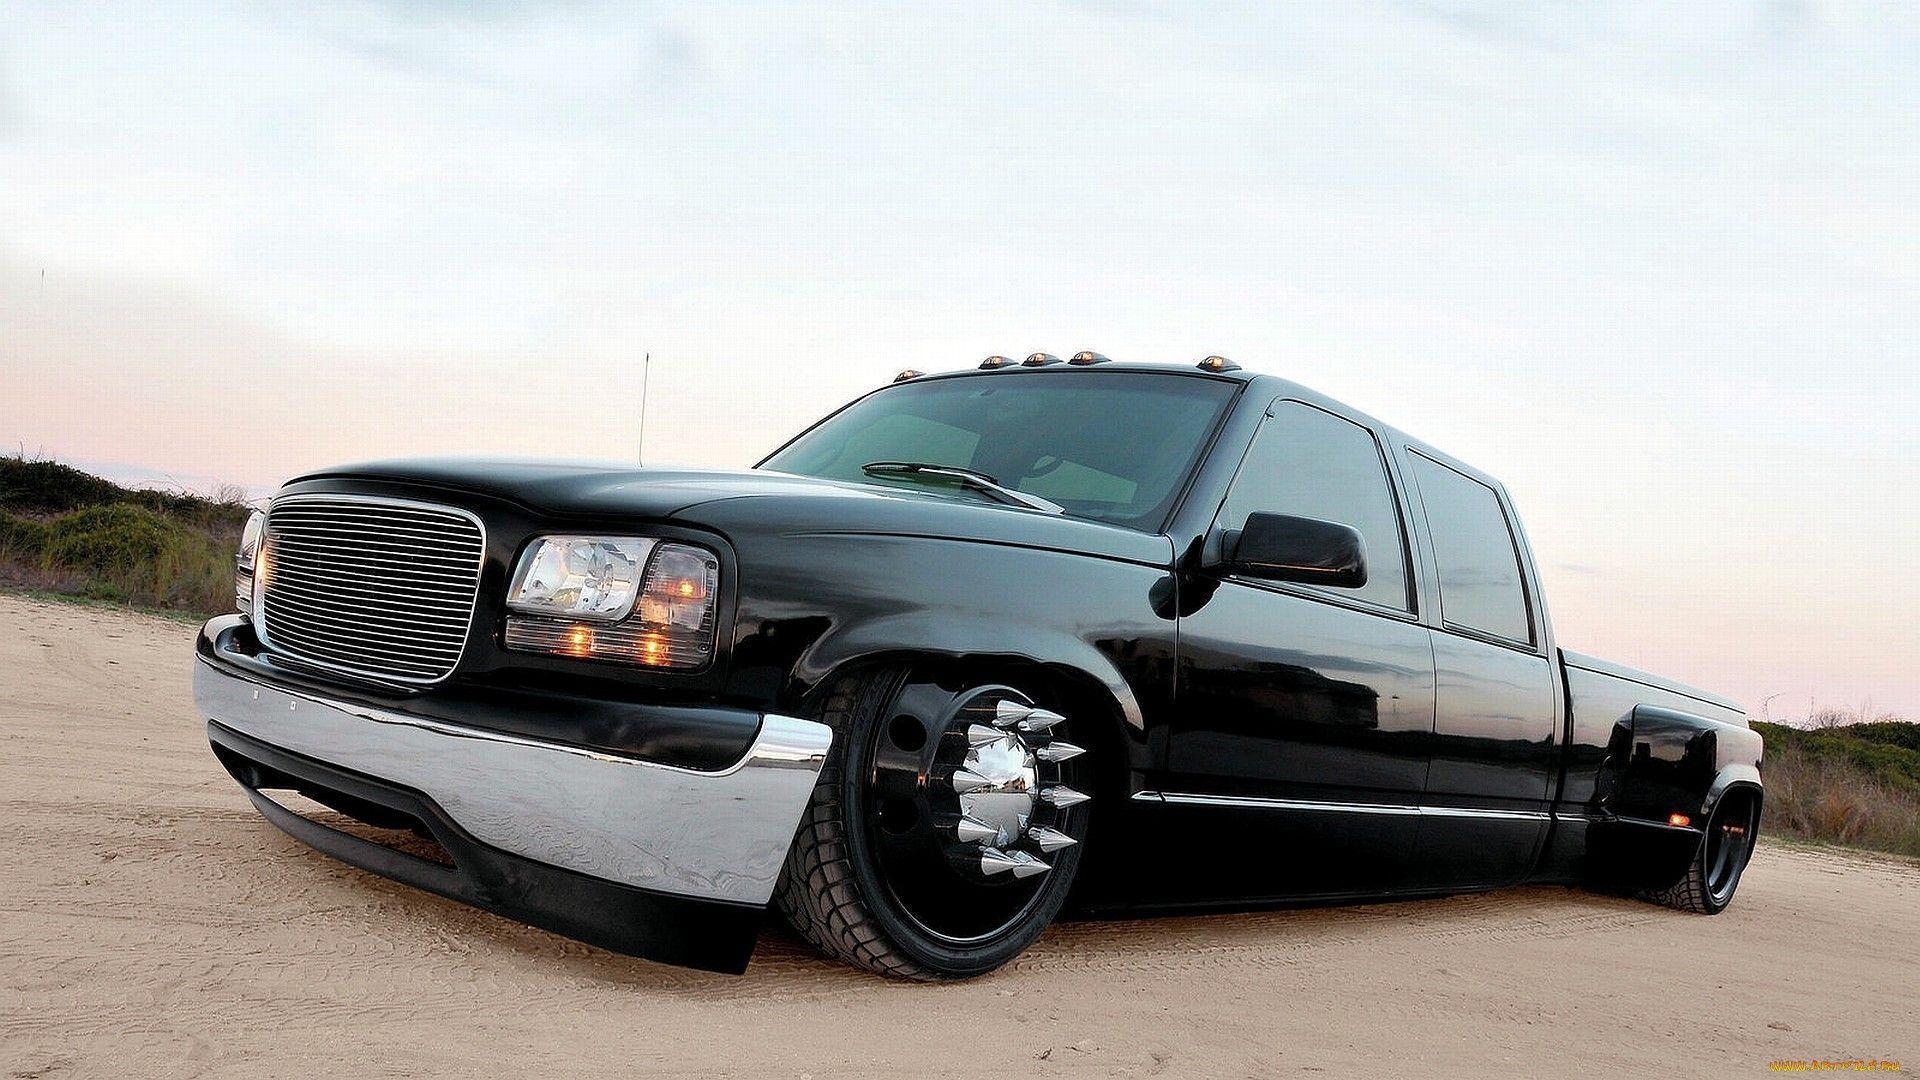 Finest Lowrider Custom Tuning Pickup Truck Wallpaper X With Chevy Trucks